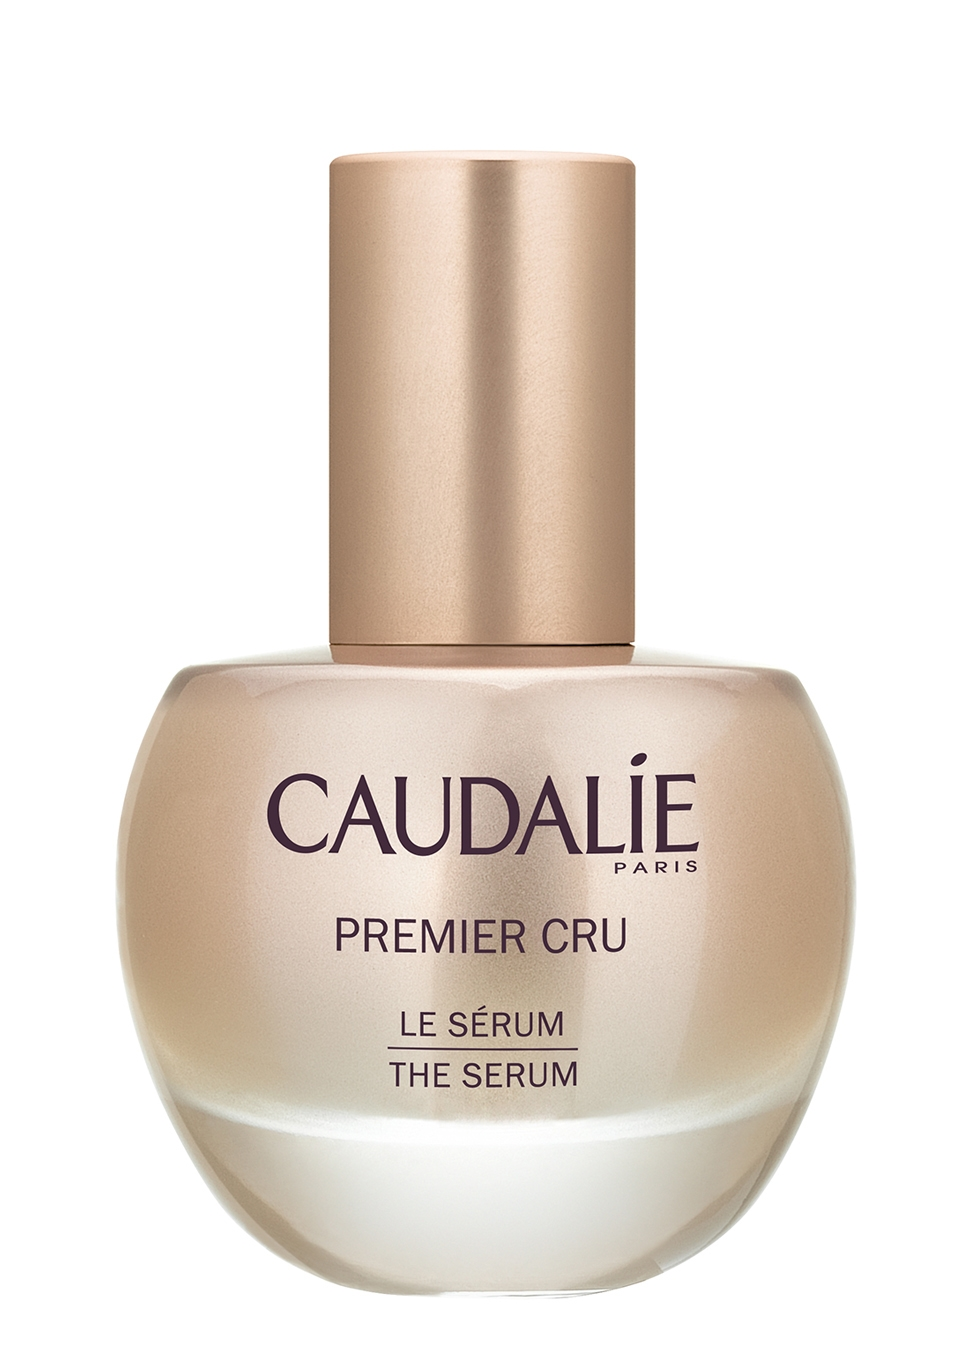 Premier Cru The Serum 30ml - CAUDALIE